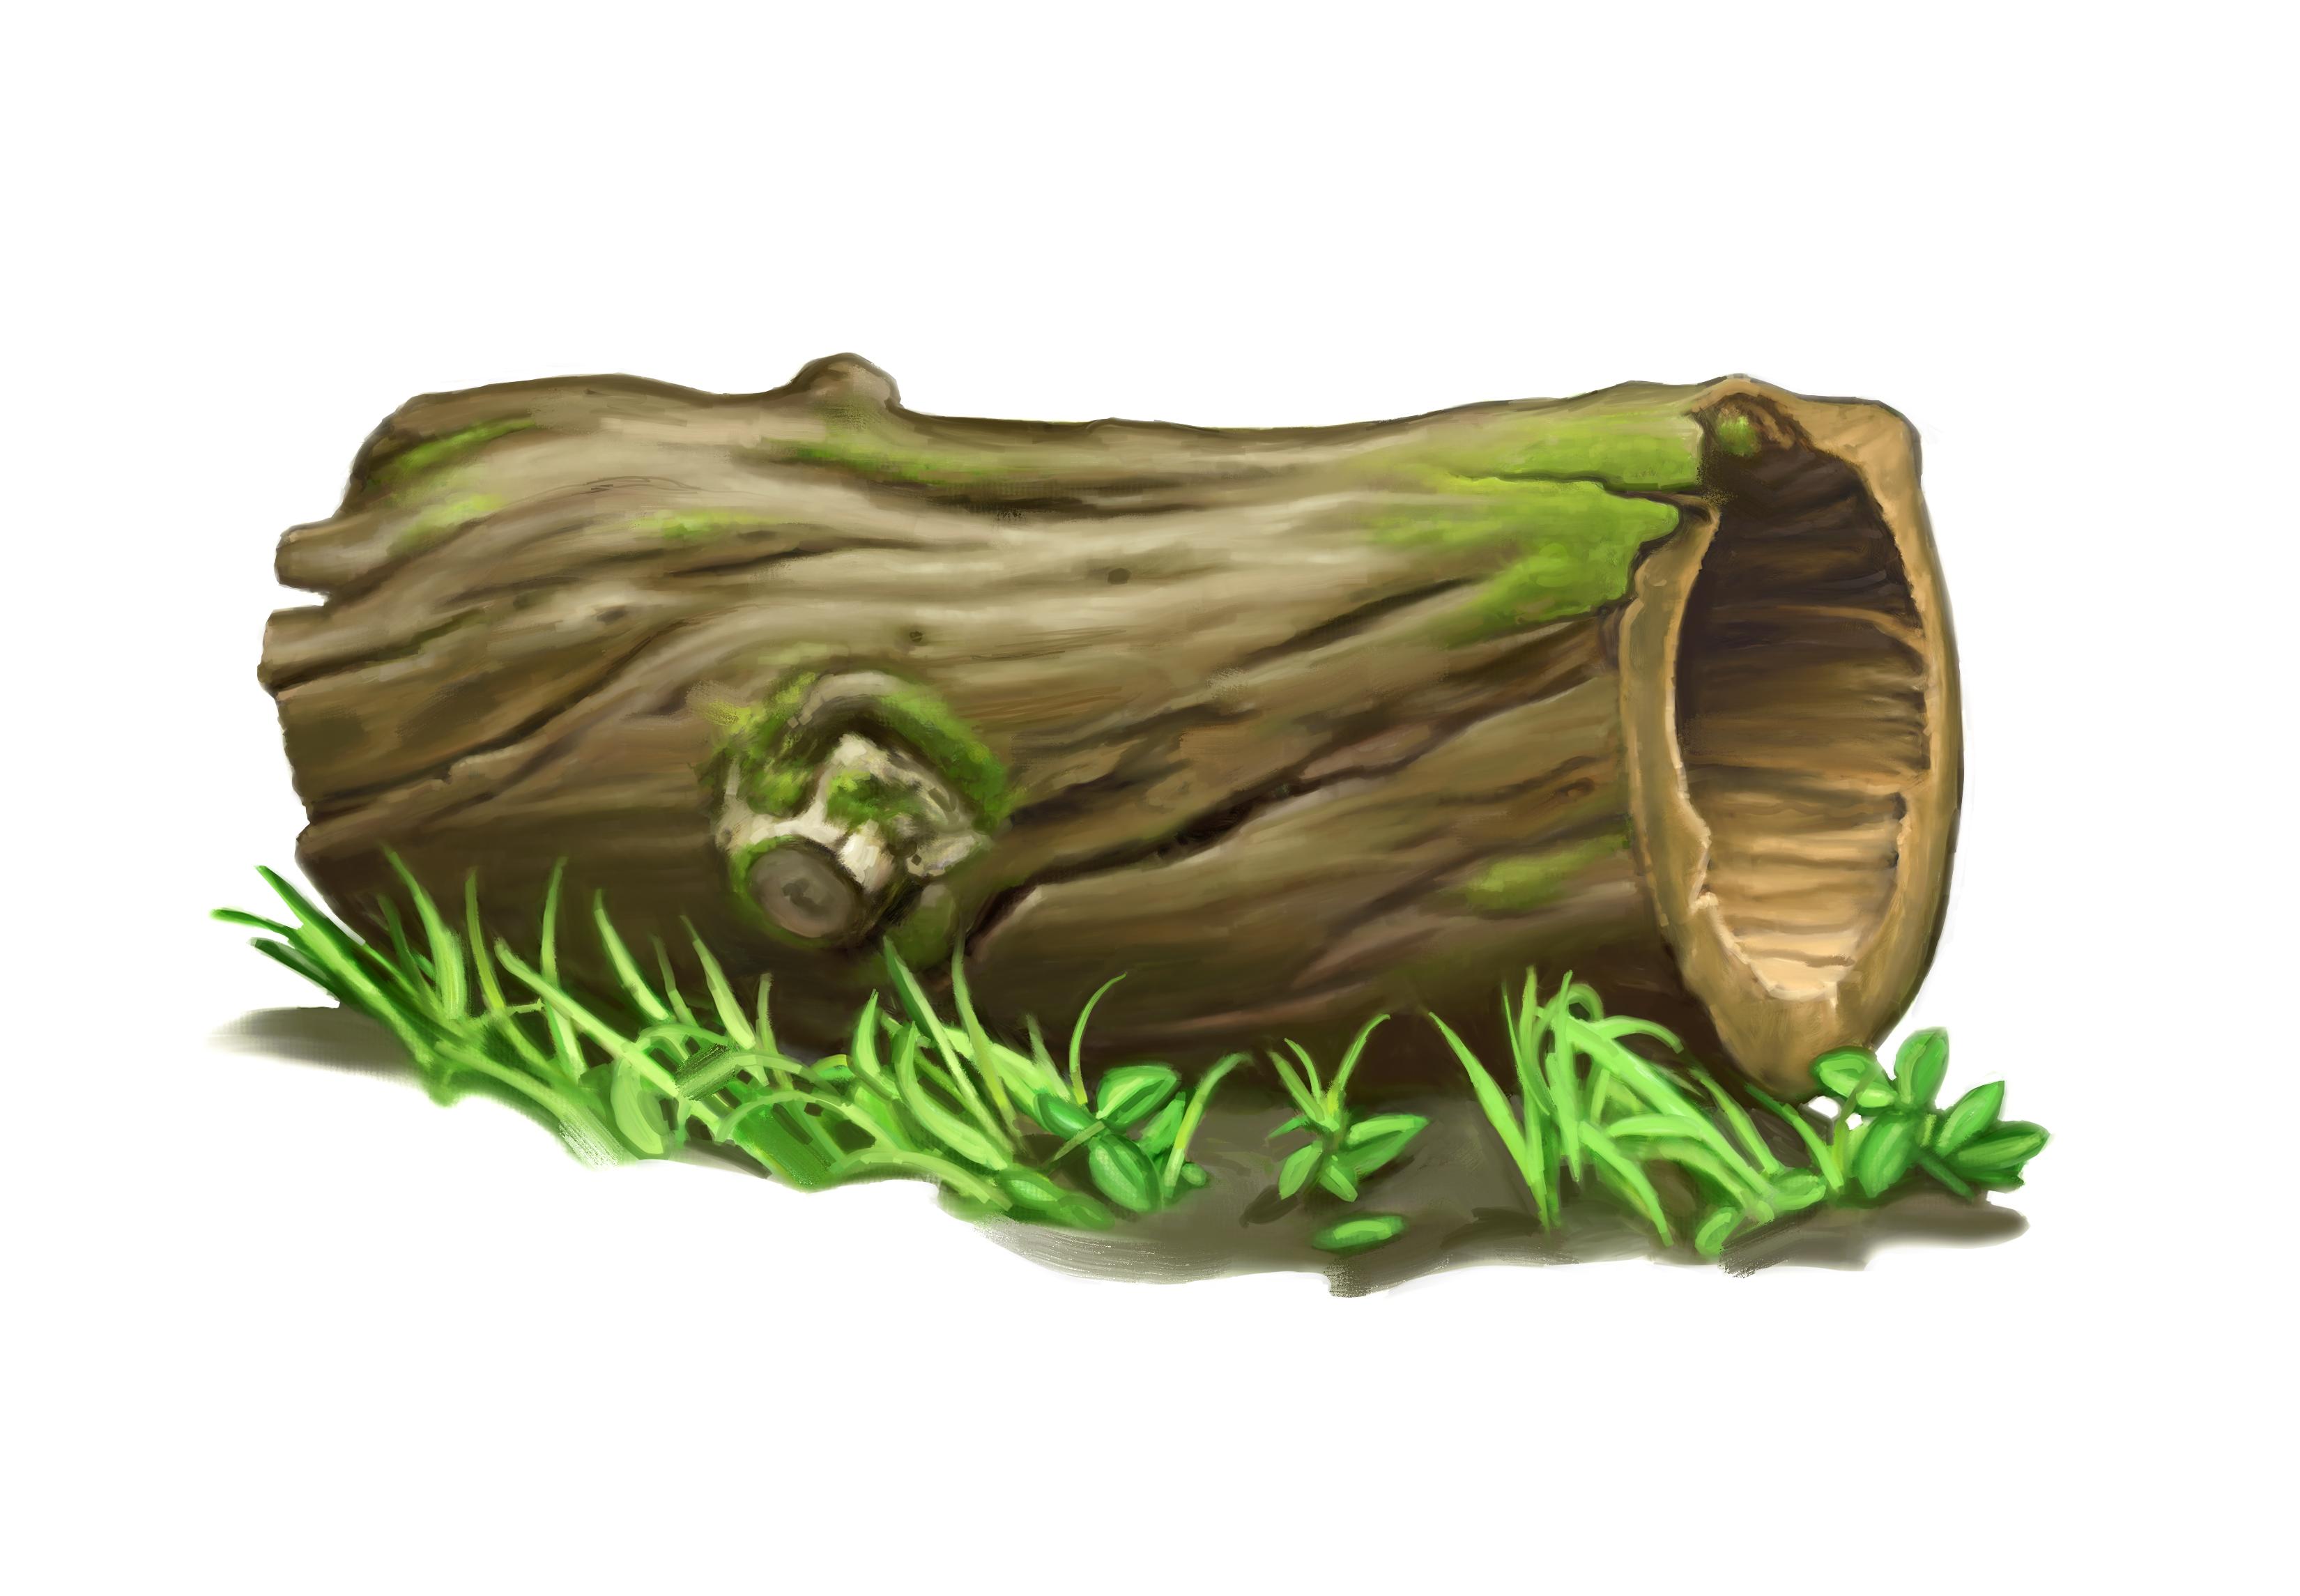 Hollow log clipart.